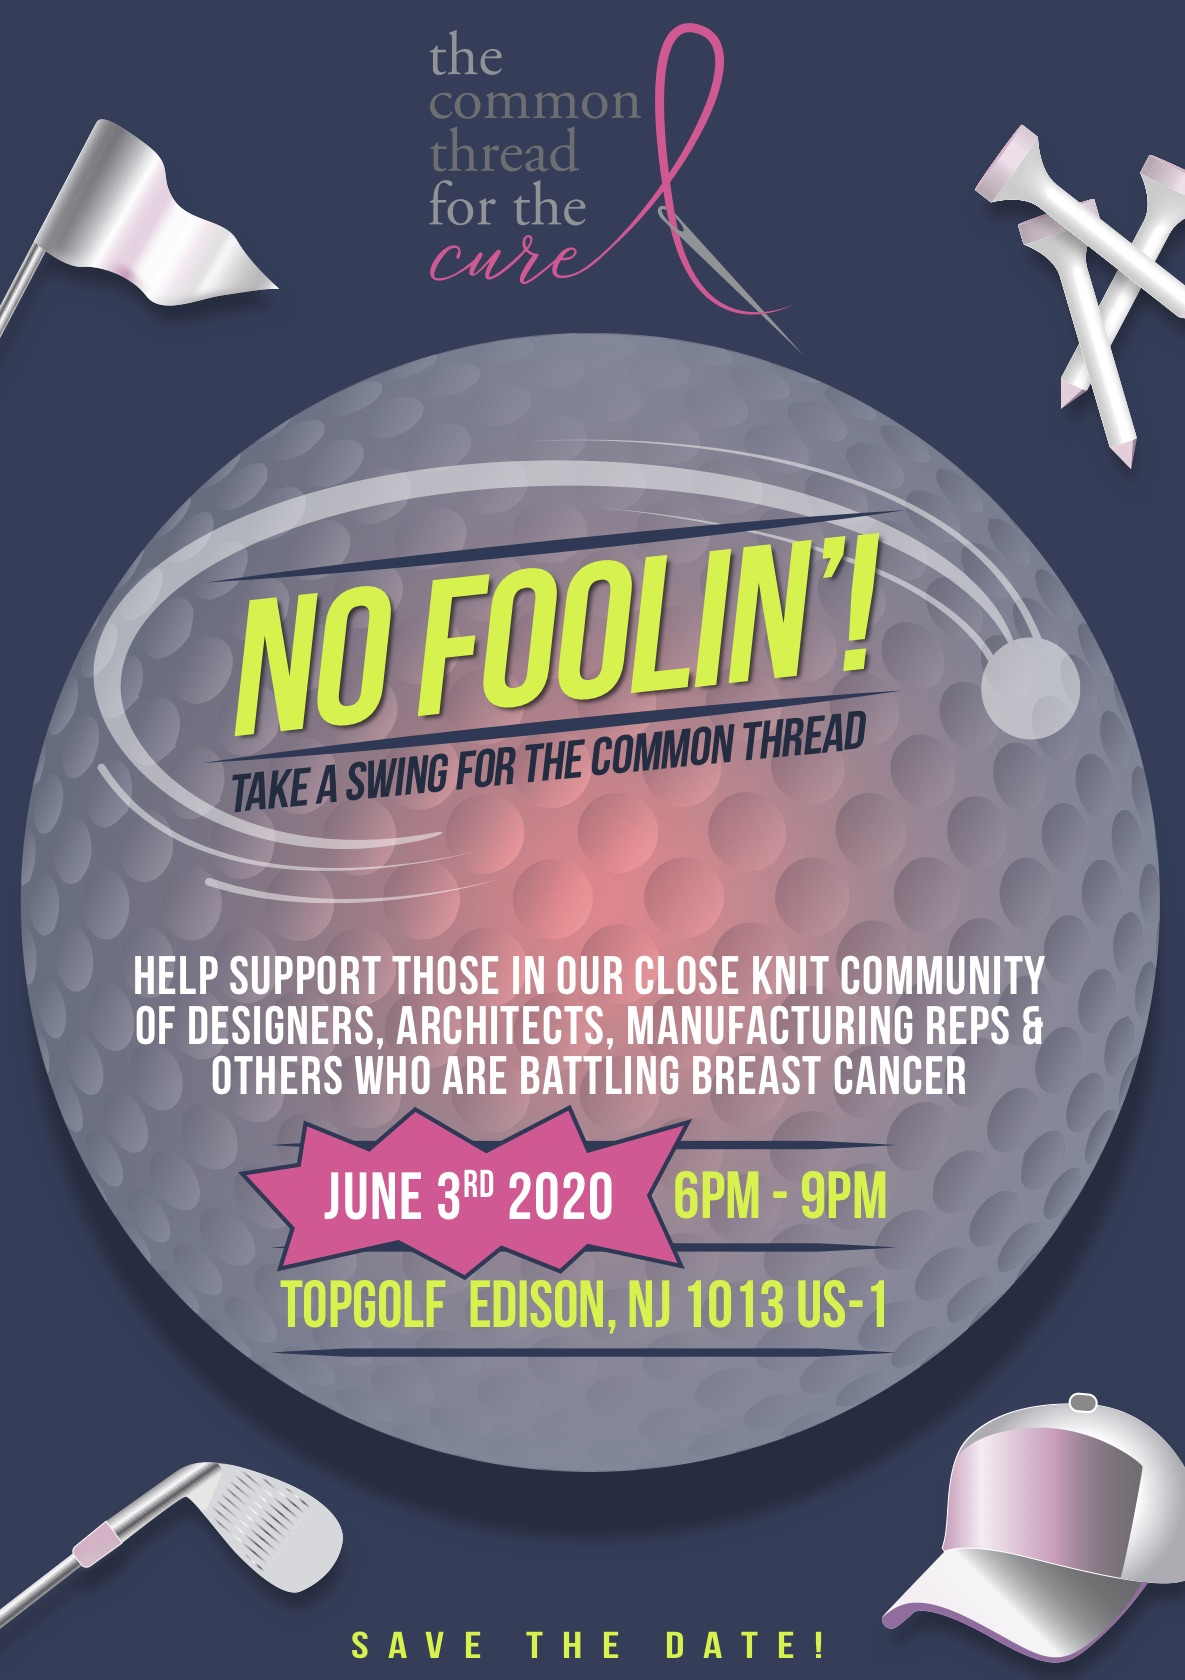 golf tournament April 1 at TopGolf in Edison, NJ postponed